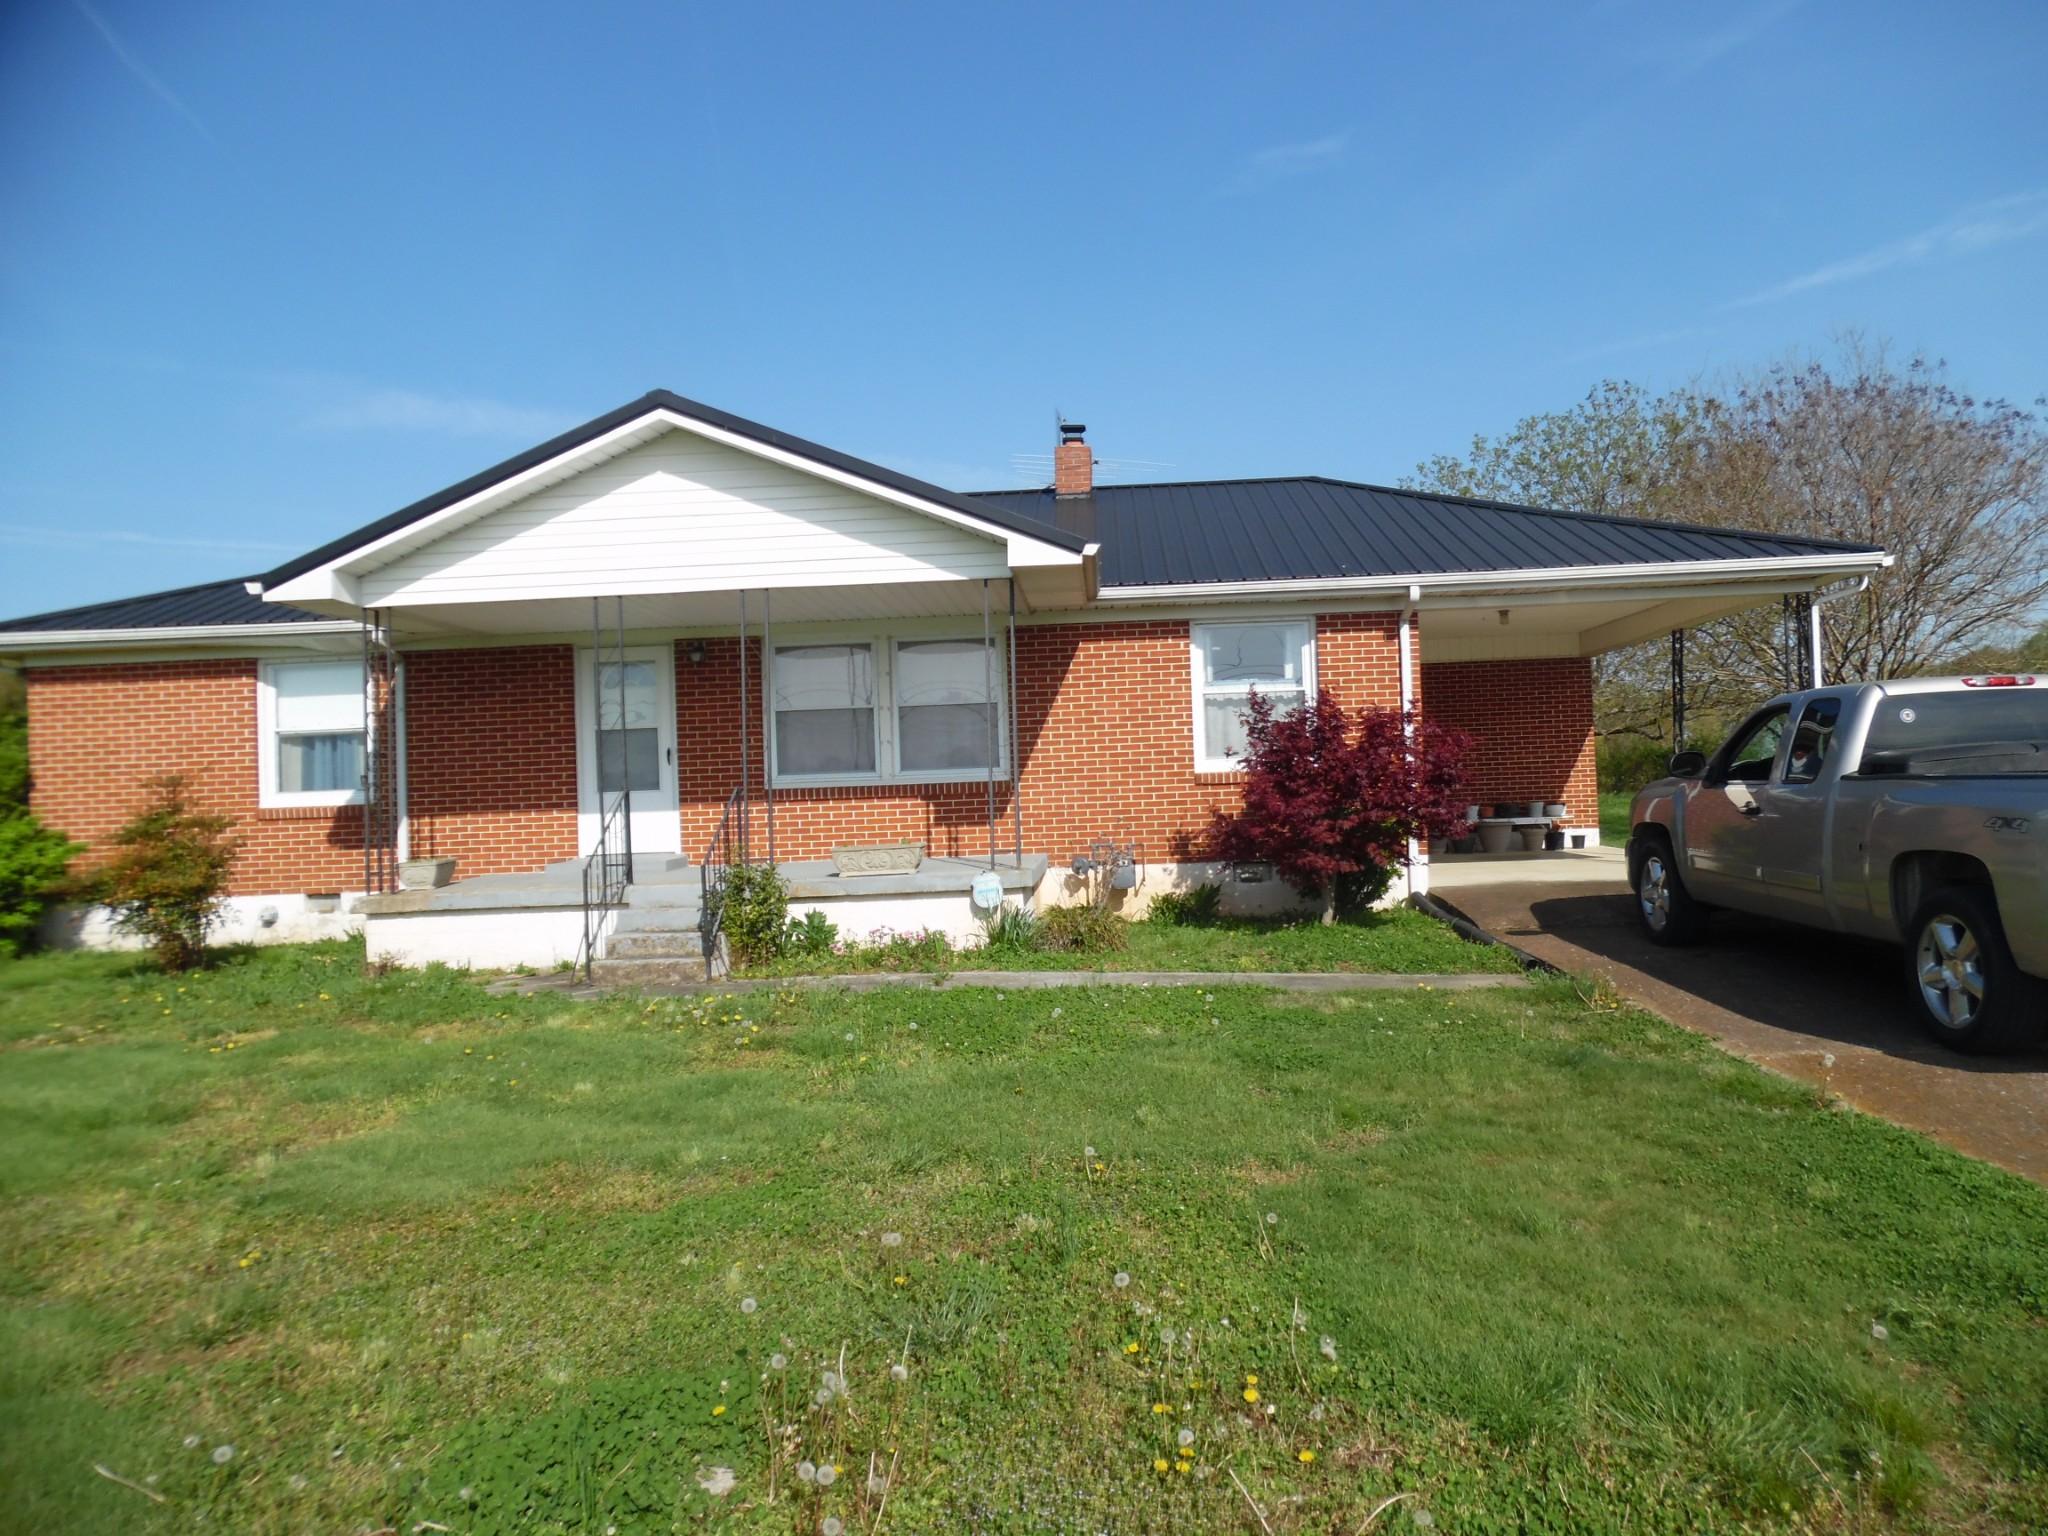 424 S Brace Rd N Property Photo - Ethridge, TN real estate listing